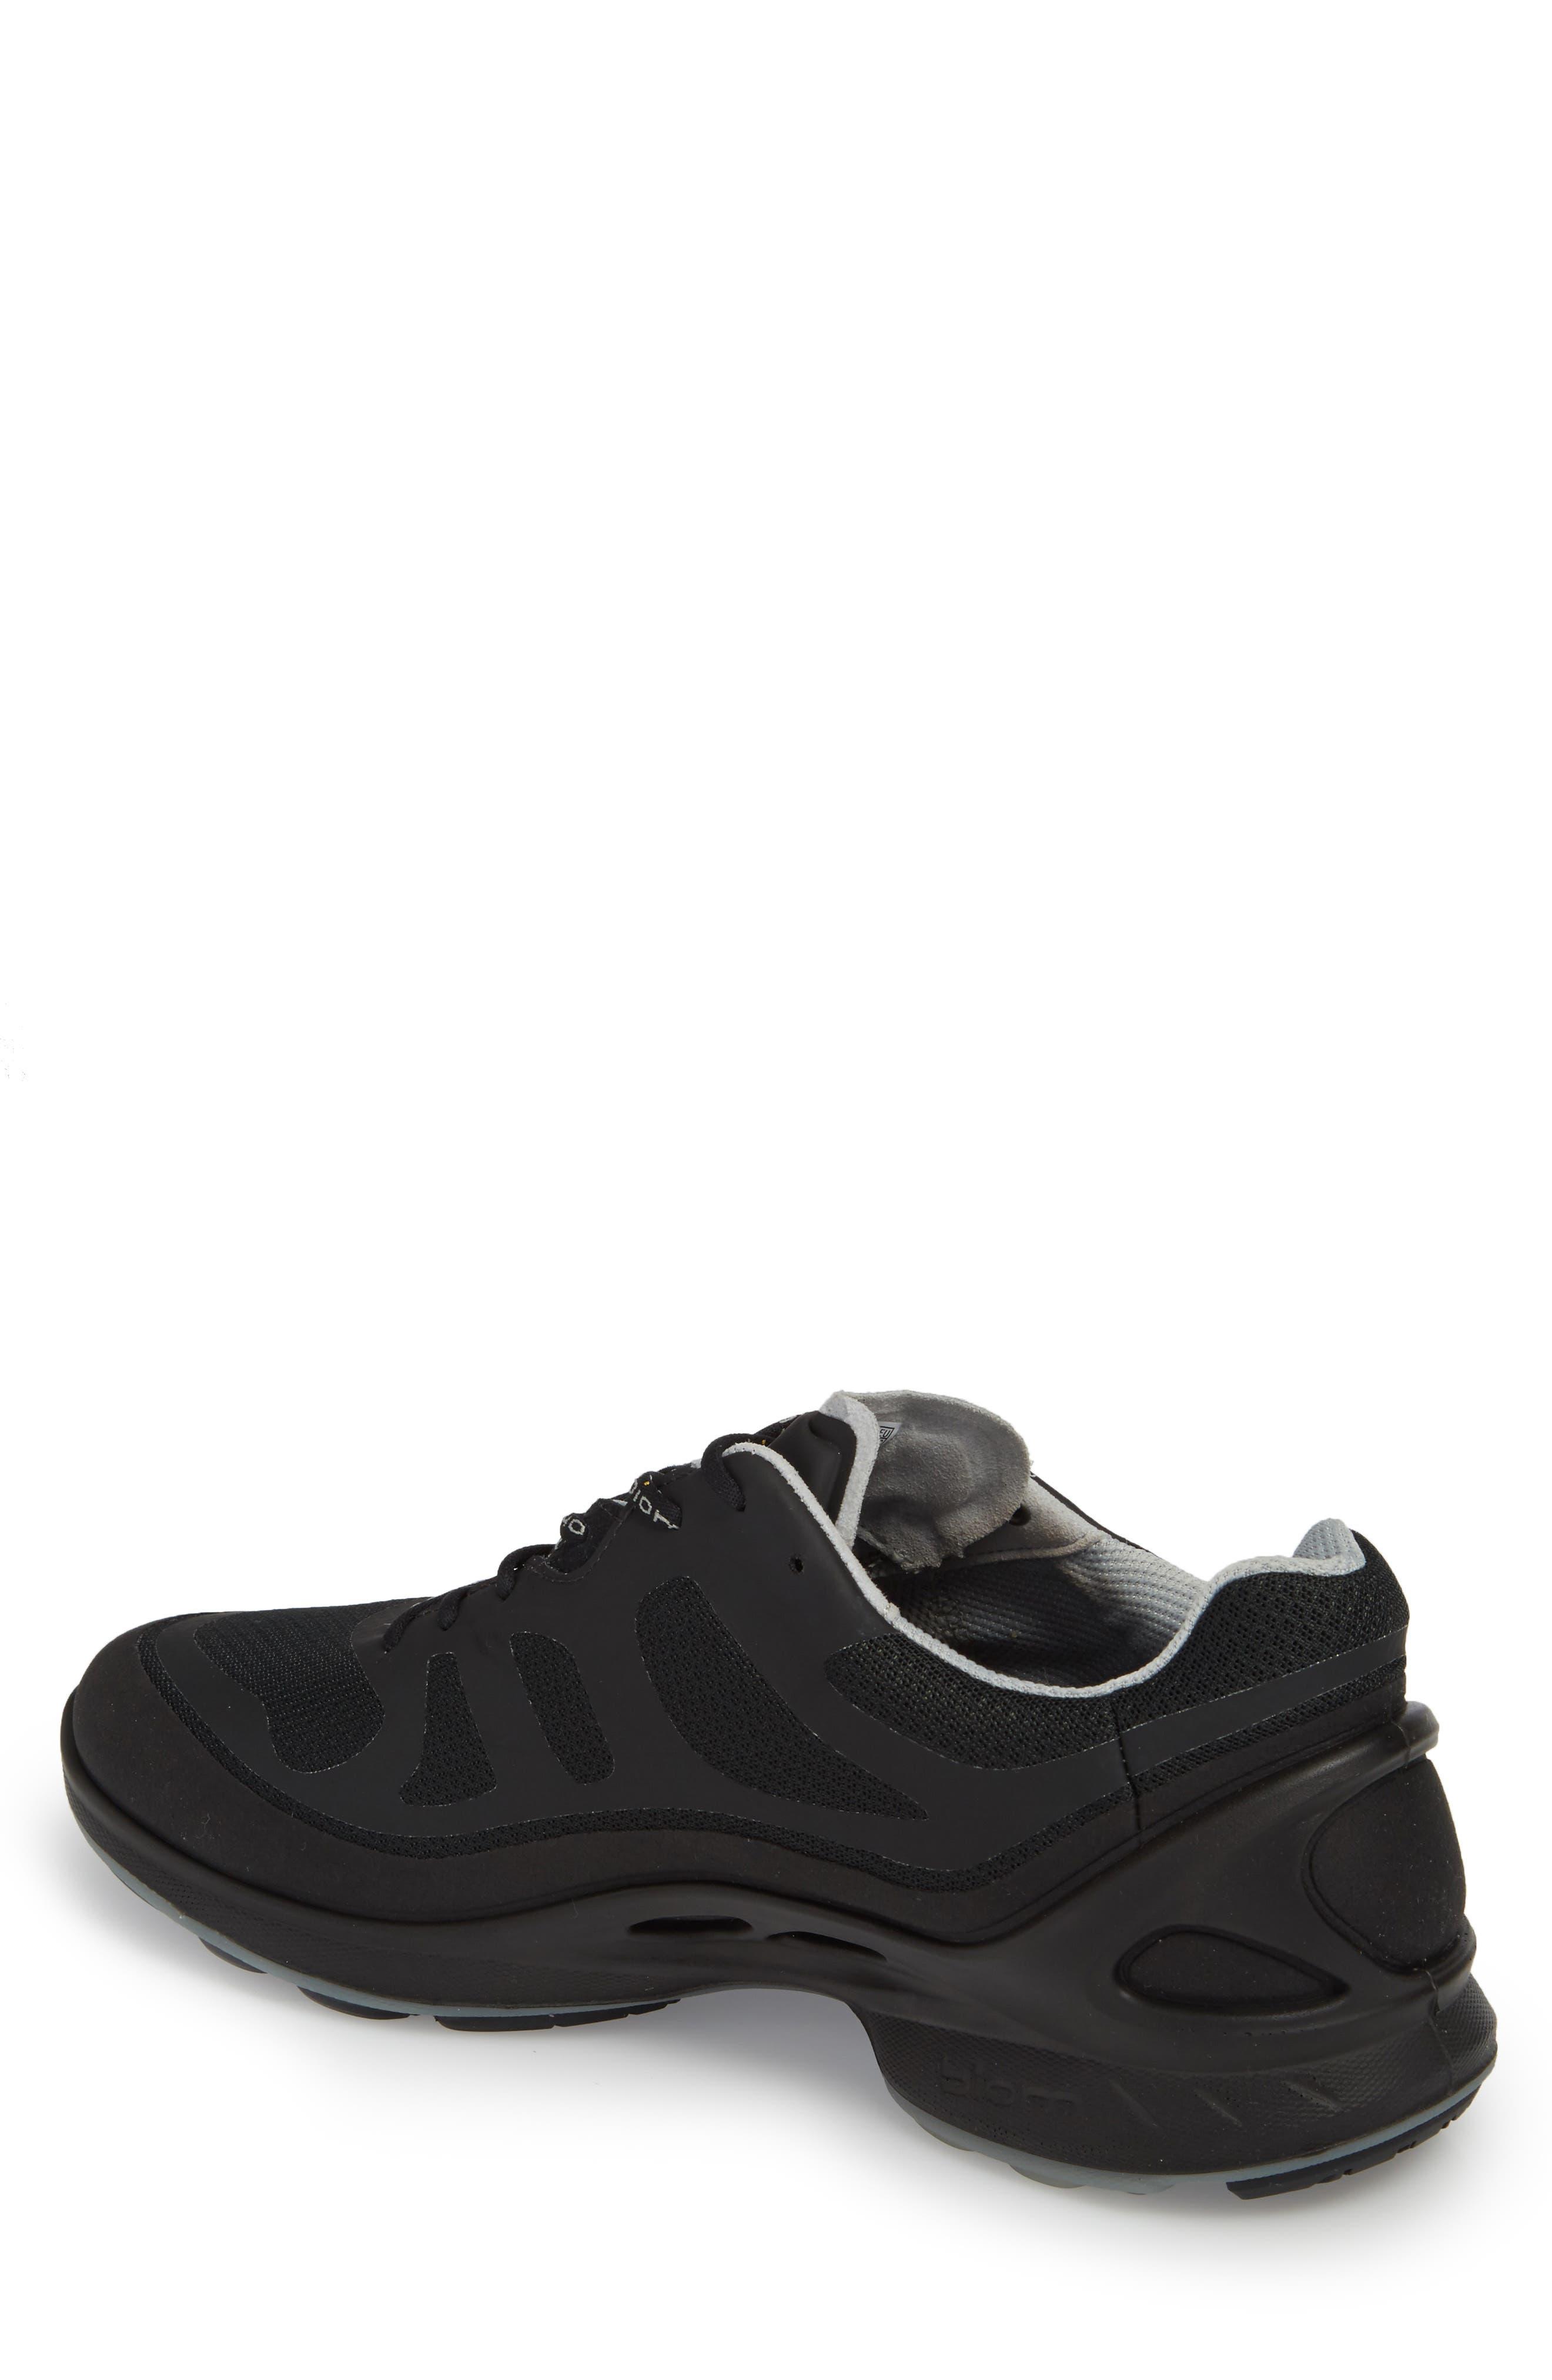 BIOM Fjuel Tie Sneaker,                             Alternate thumbnail 2, color,                             009